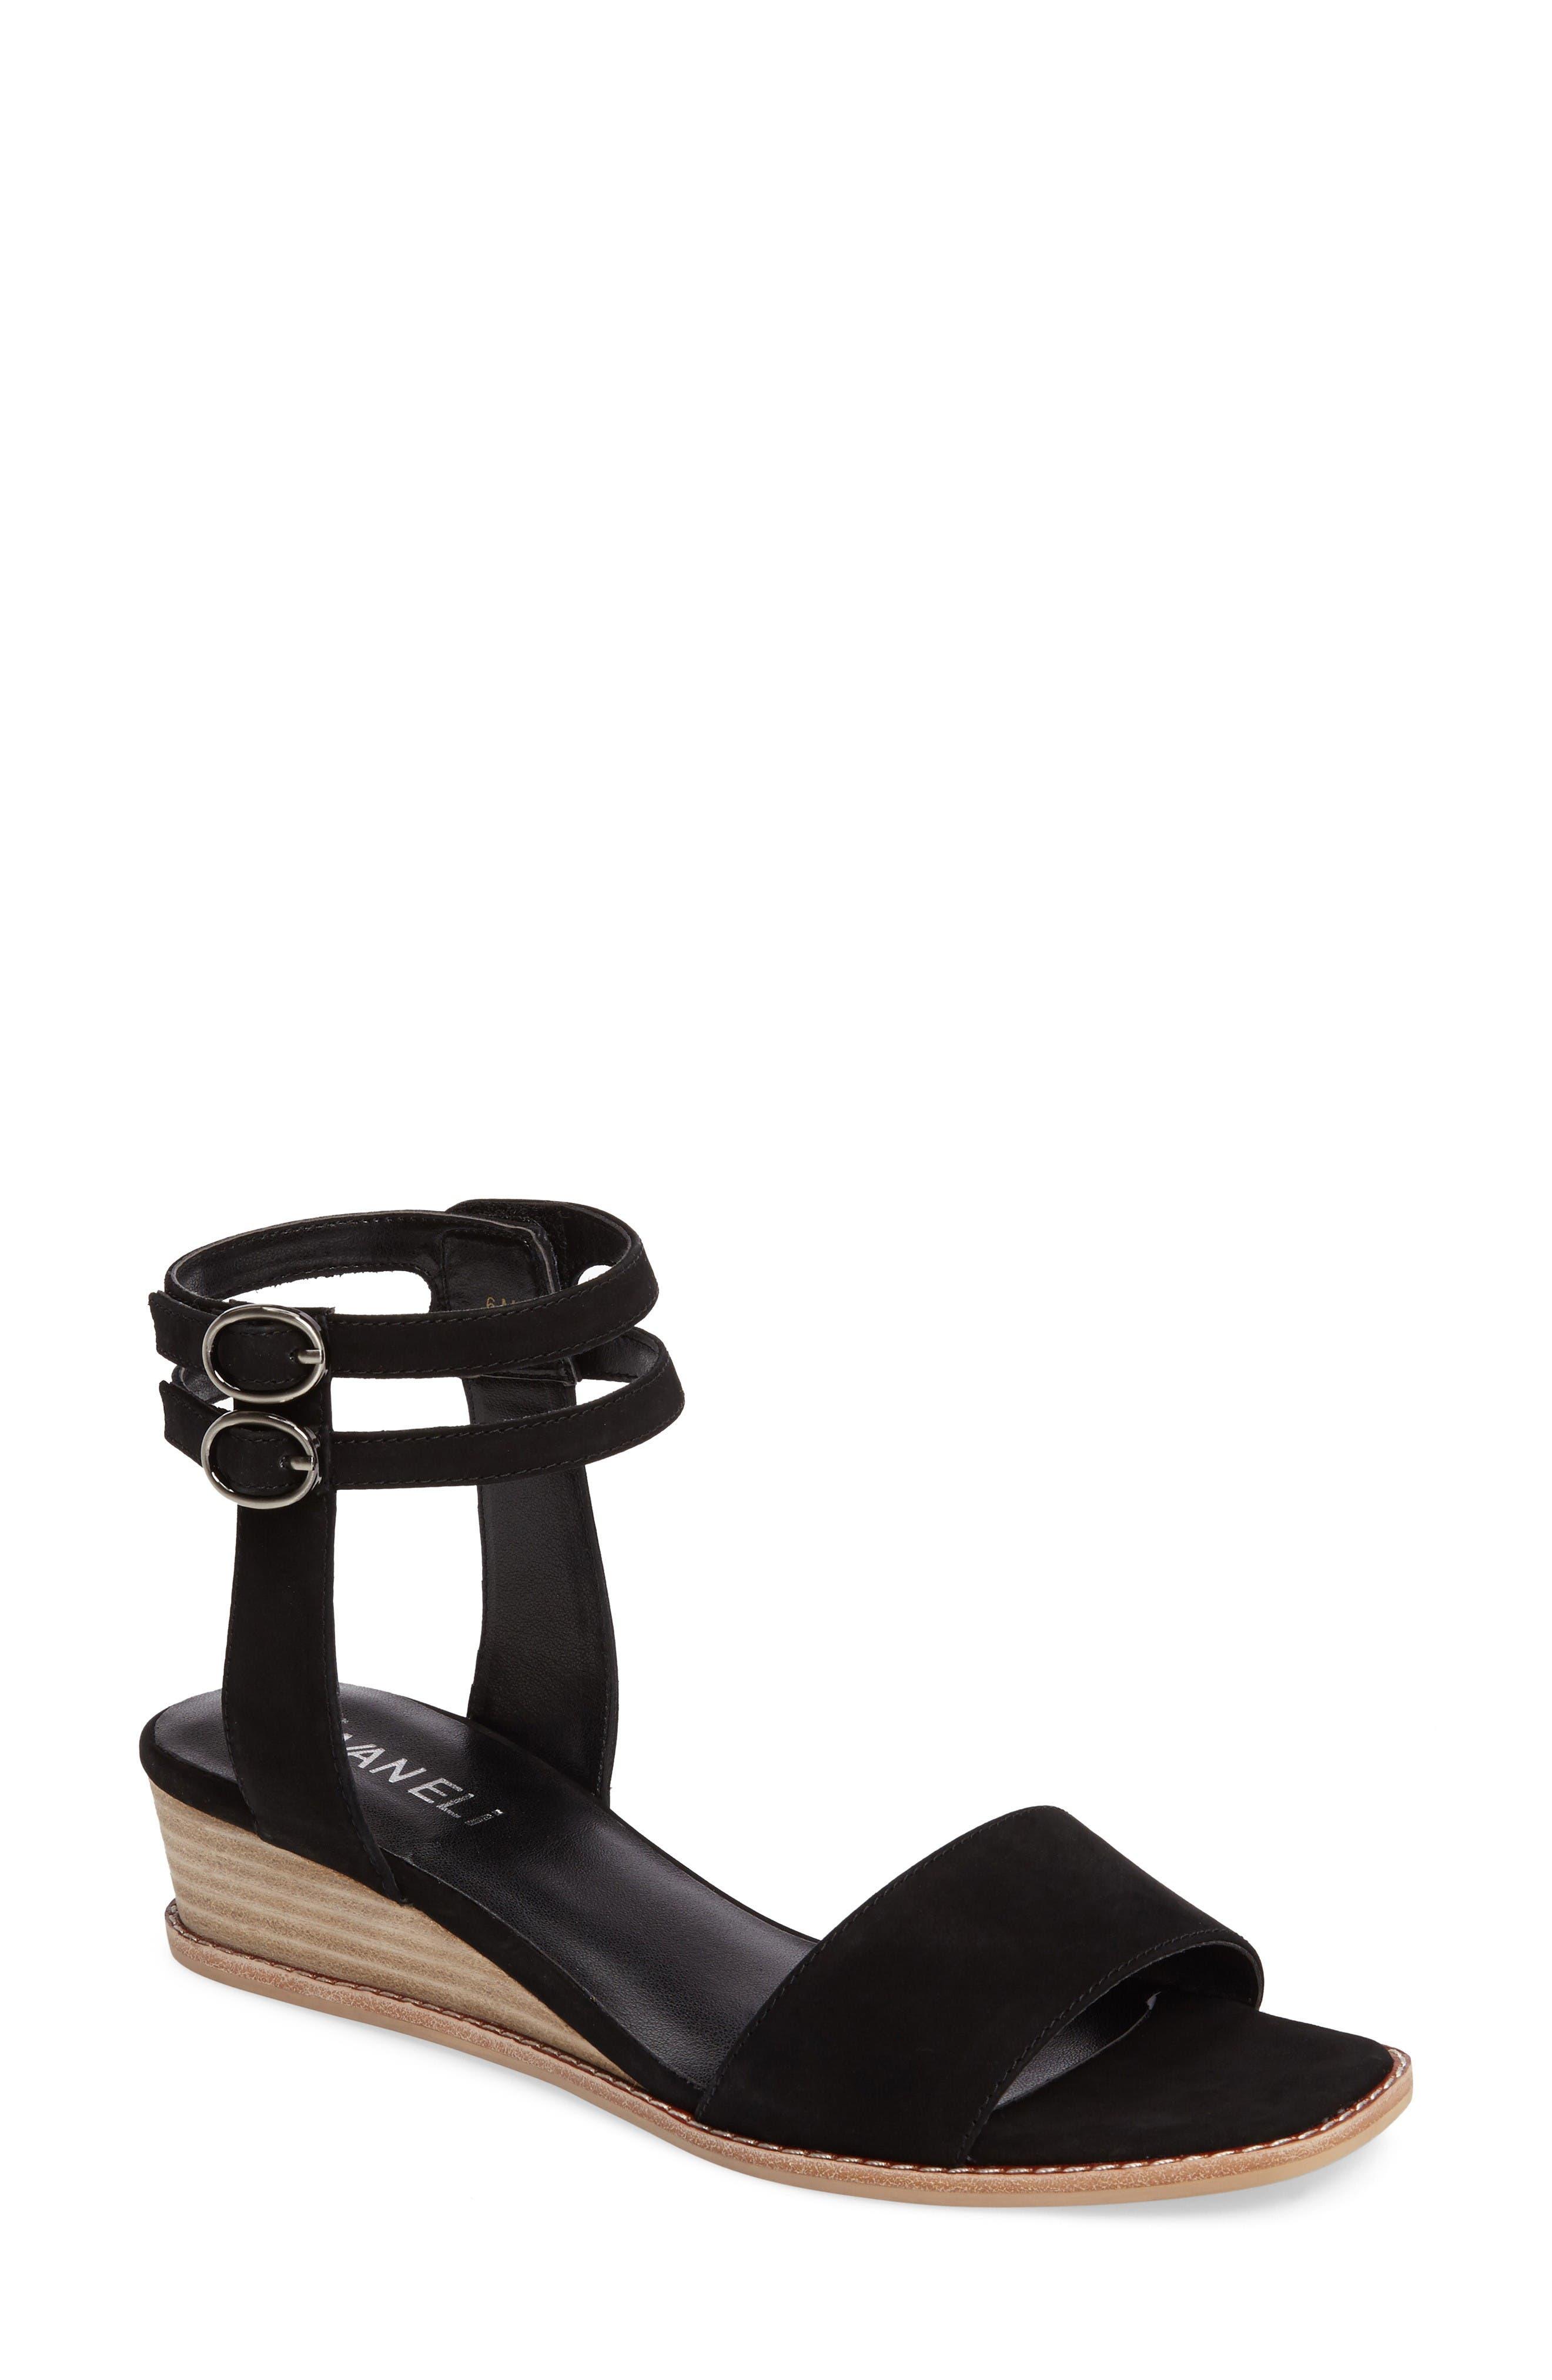 Jarita Ankle Strap Sandal,                         Main,                         color, Black Leather